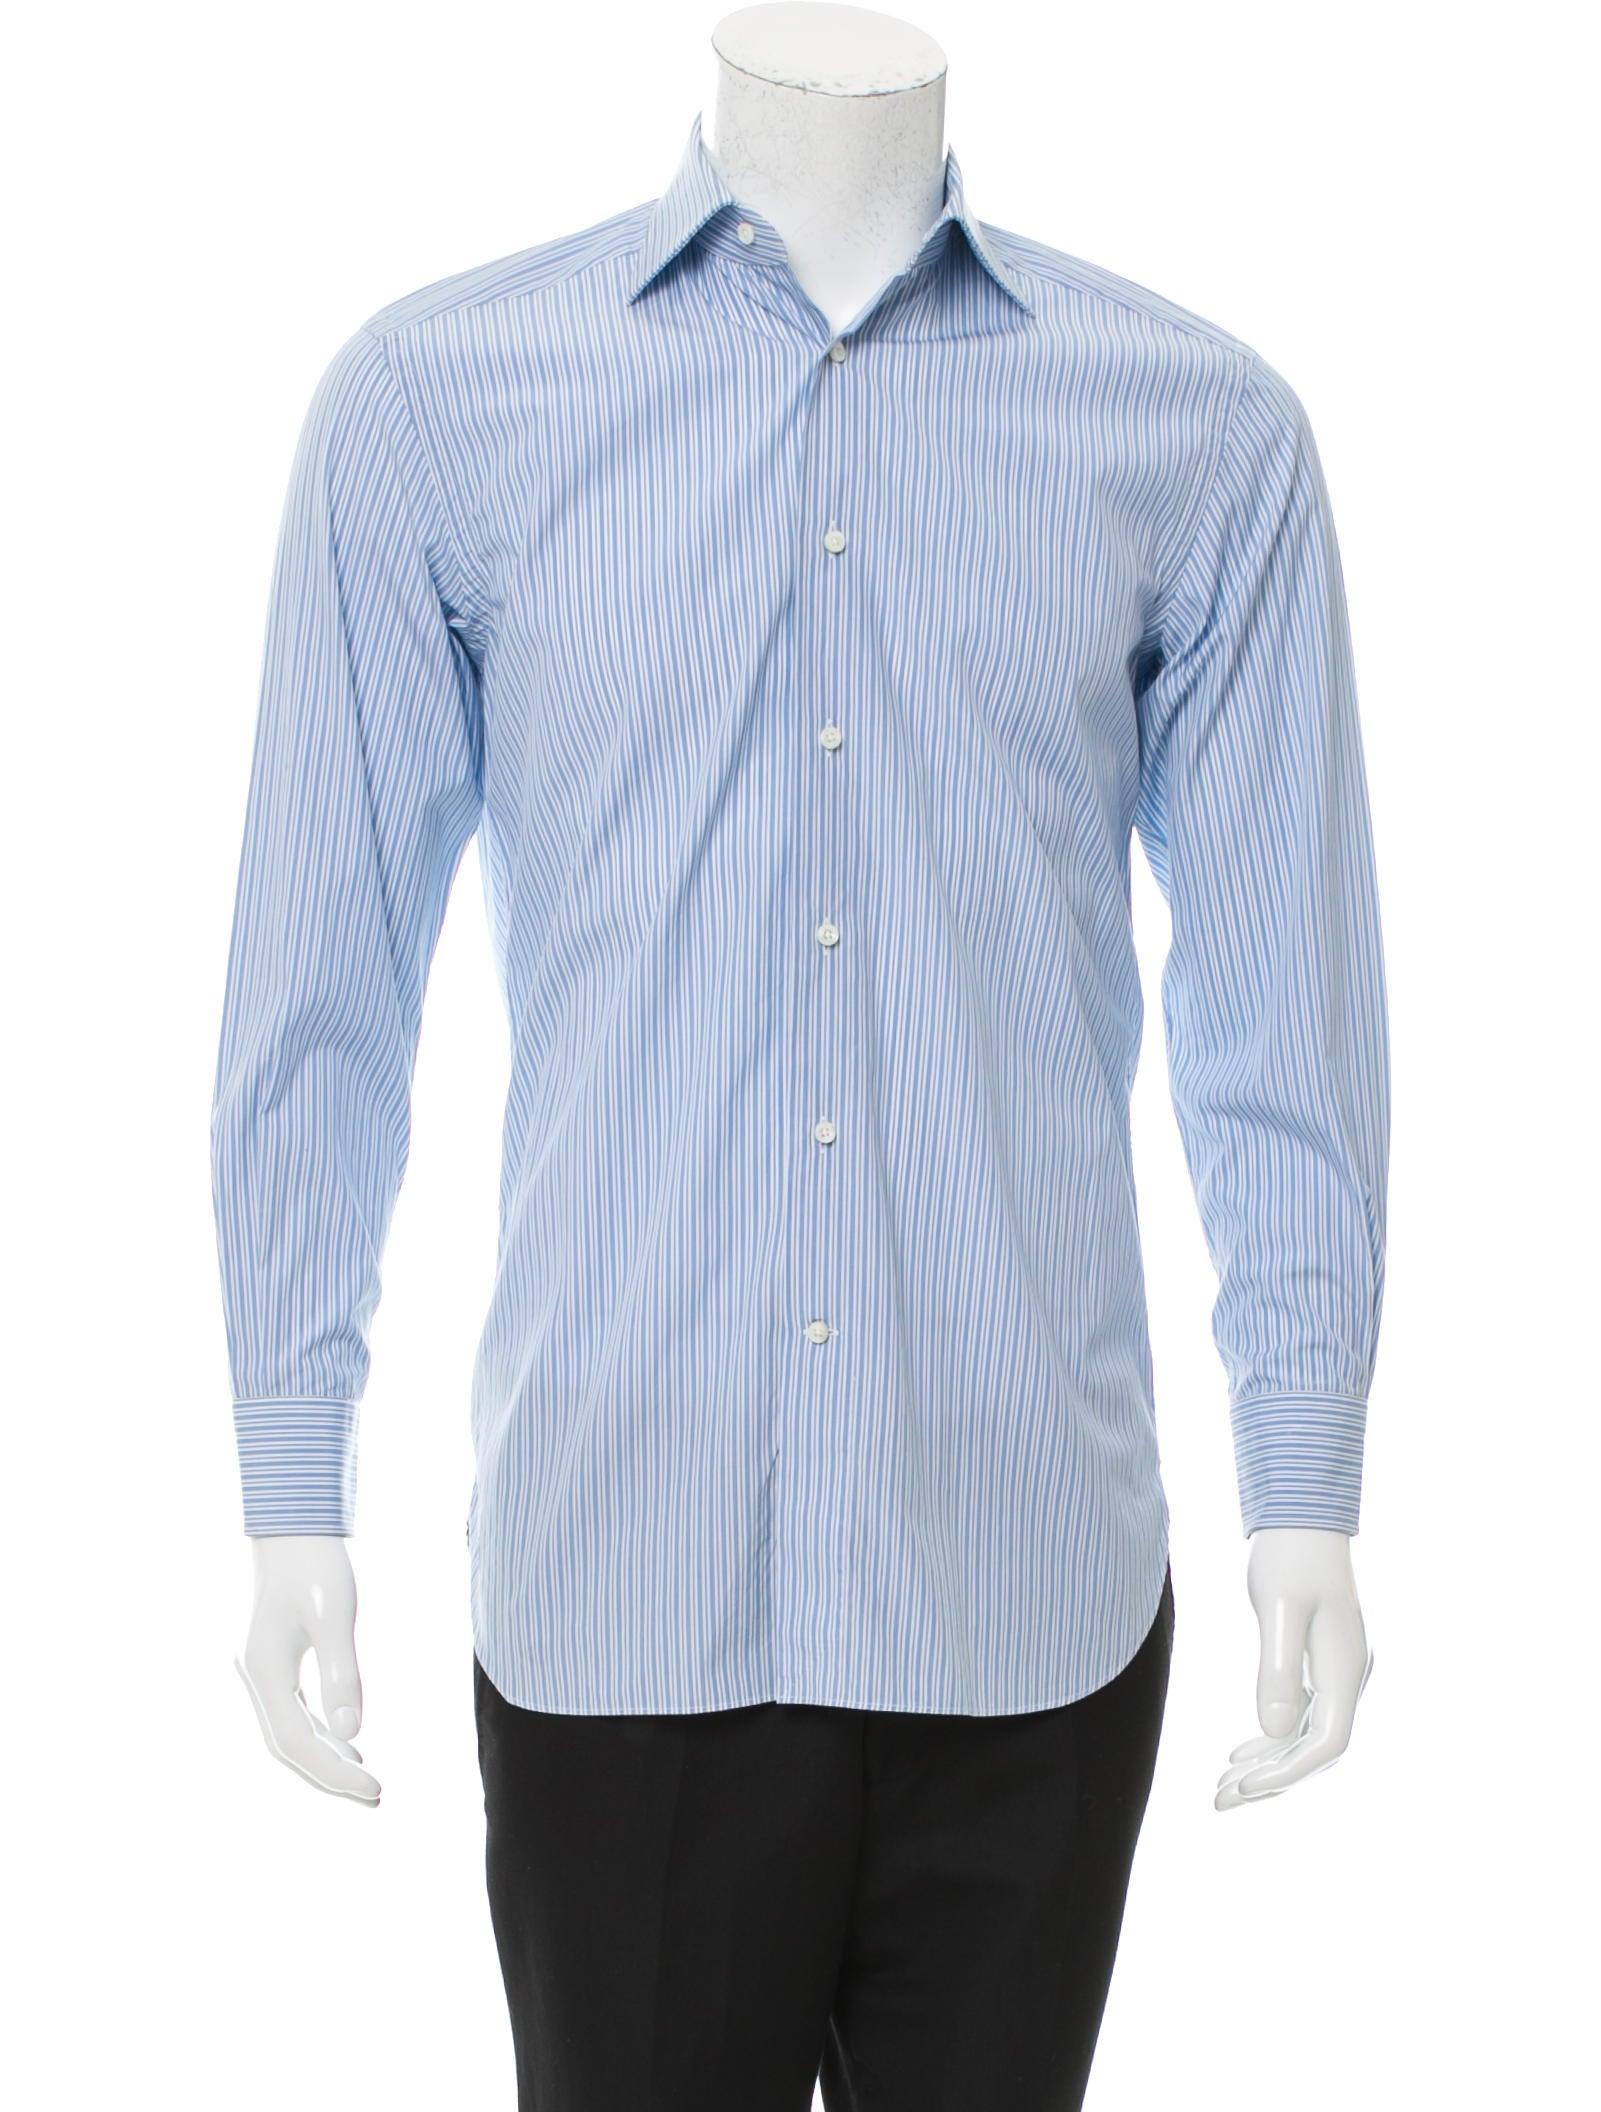 ermenegildo zegna striped button up shirt clothing zgn24337 the realreal. Black Bedroom Furniture Sets. Home Design Ideas